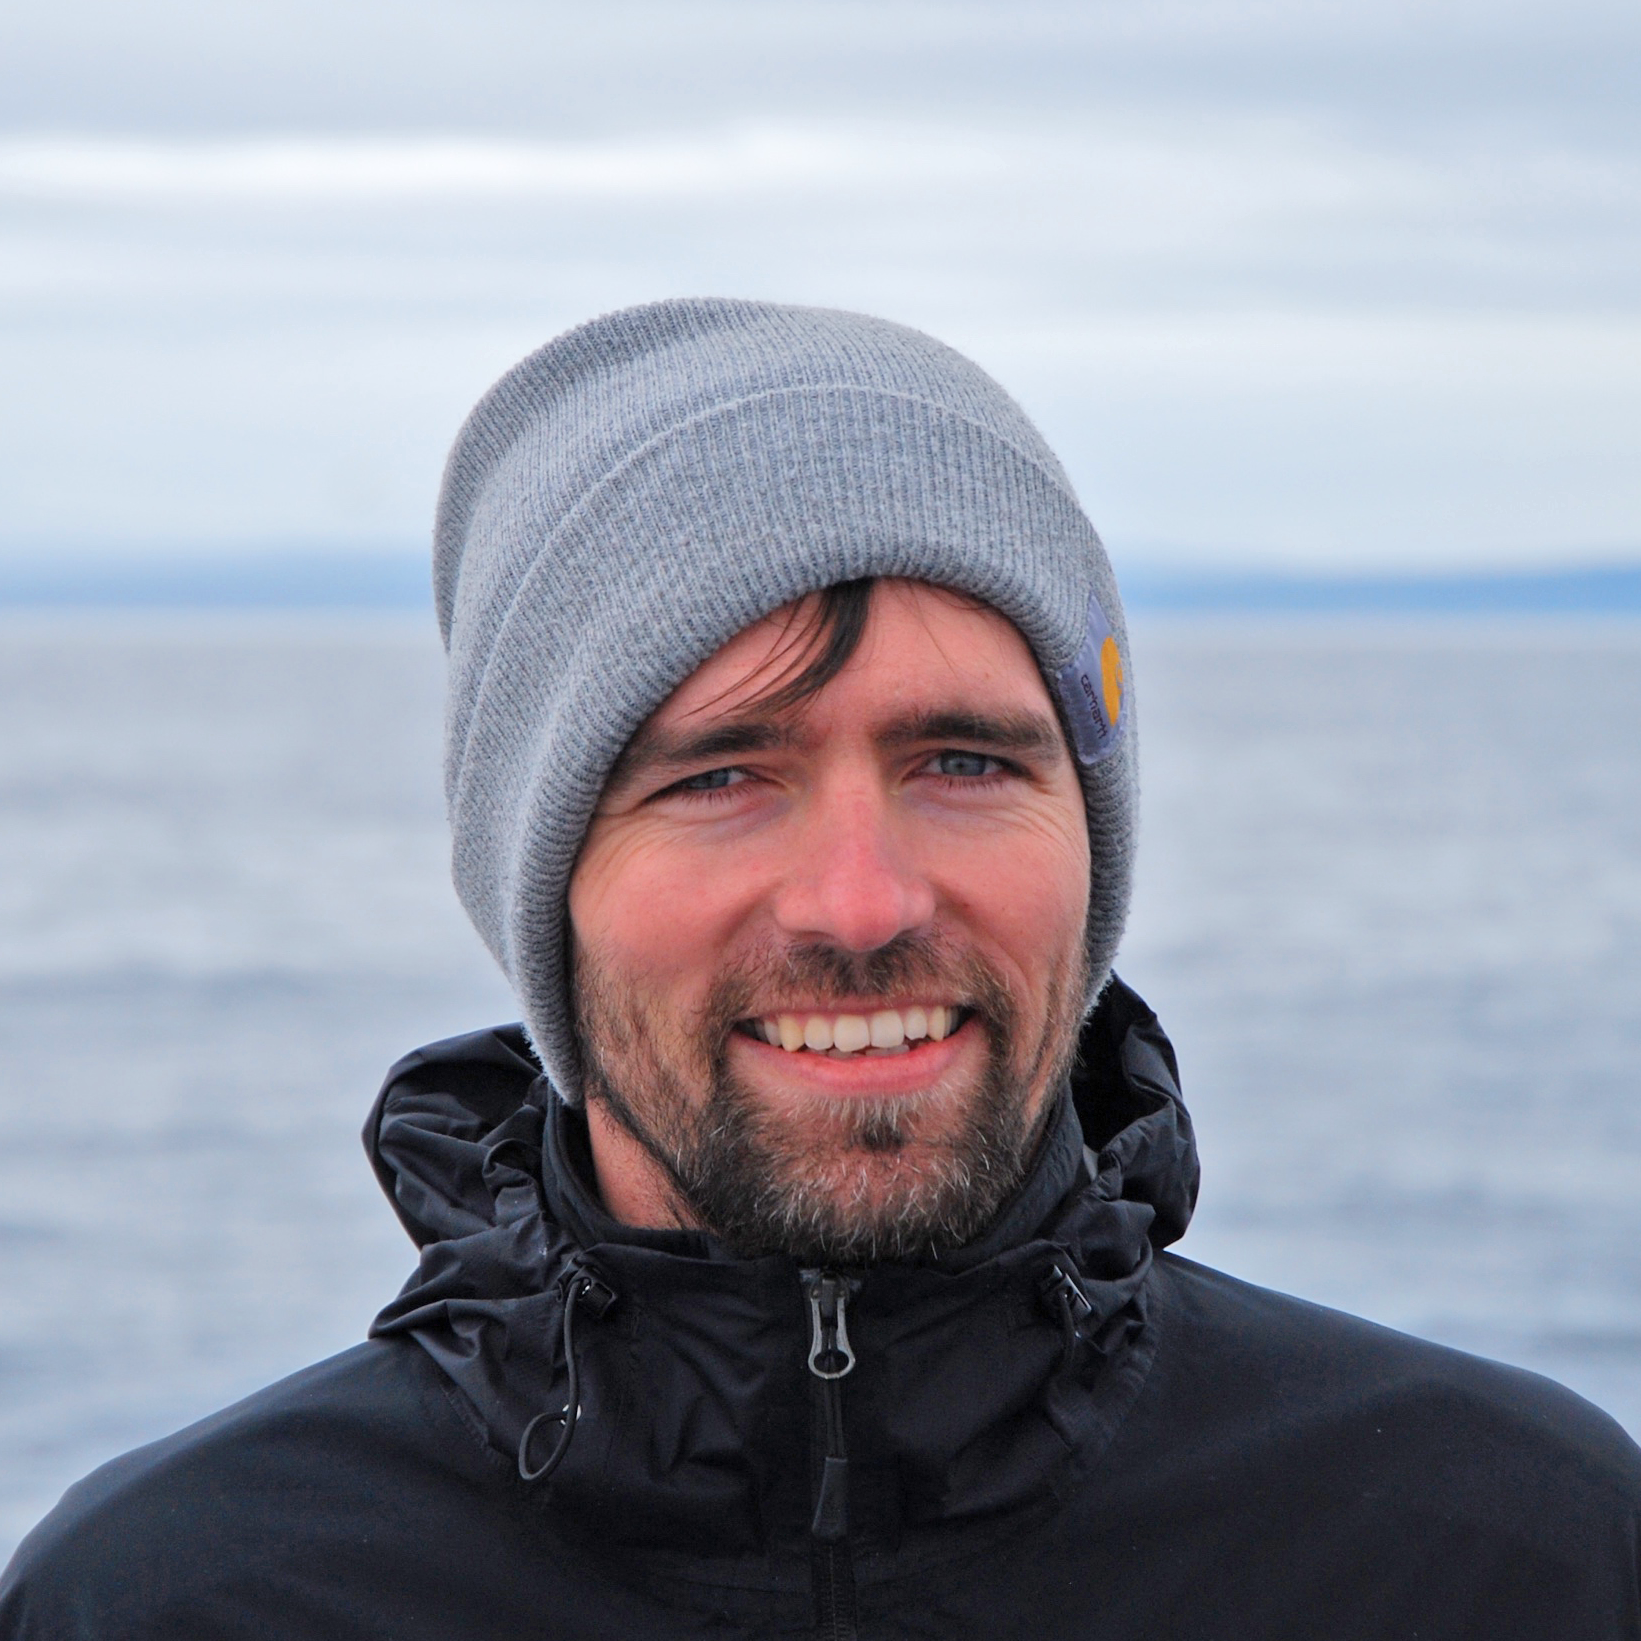 Bart Elmore headshot. Gray beanie. Ocean and gray sky in background.